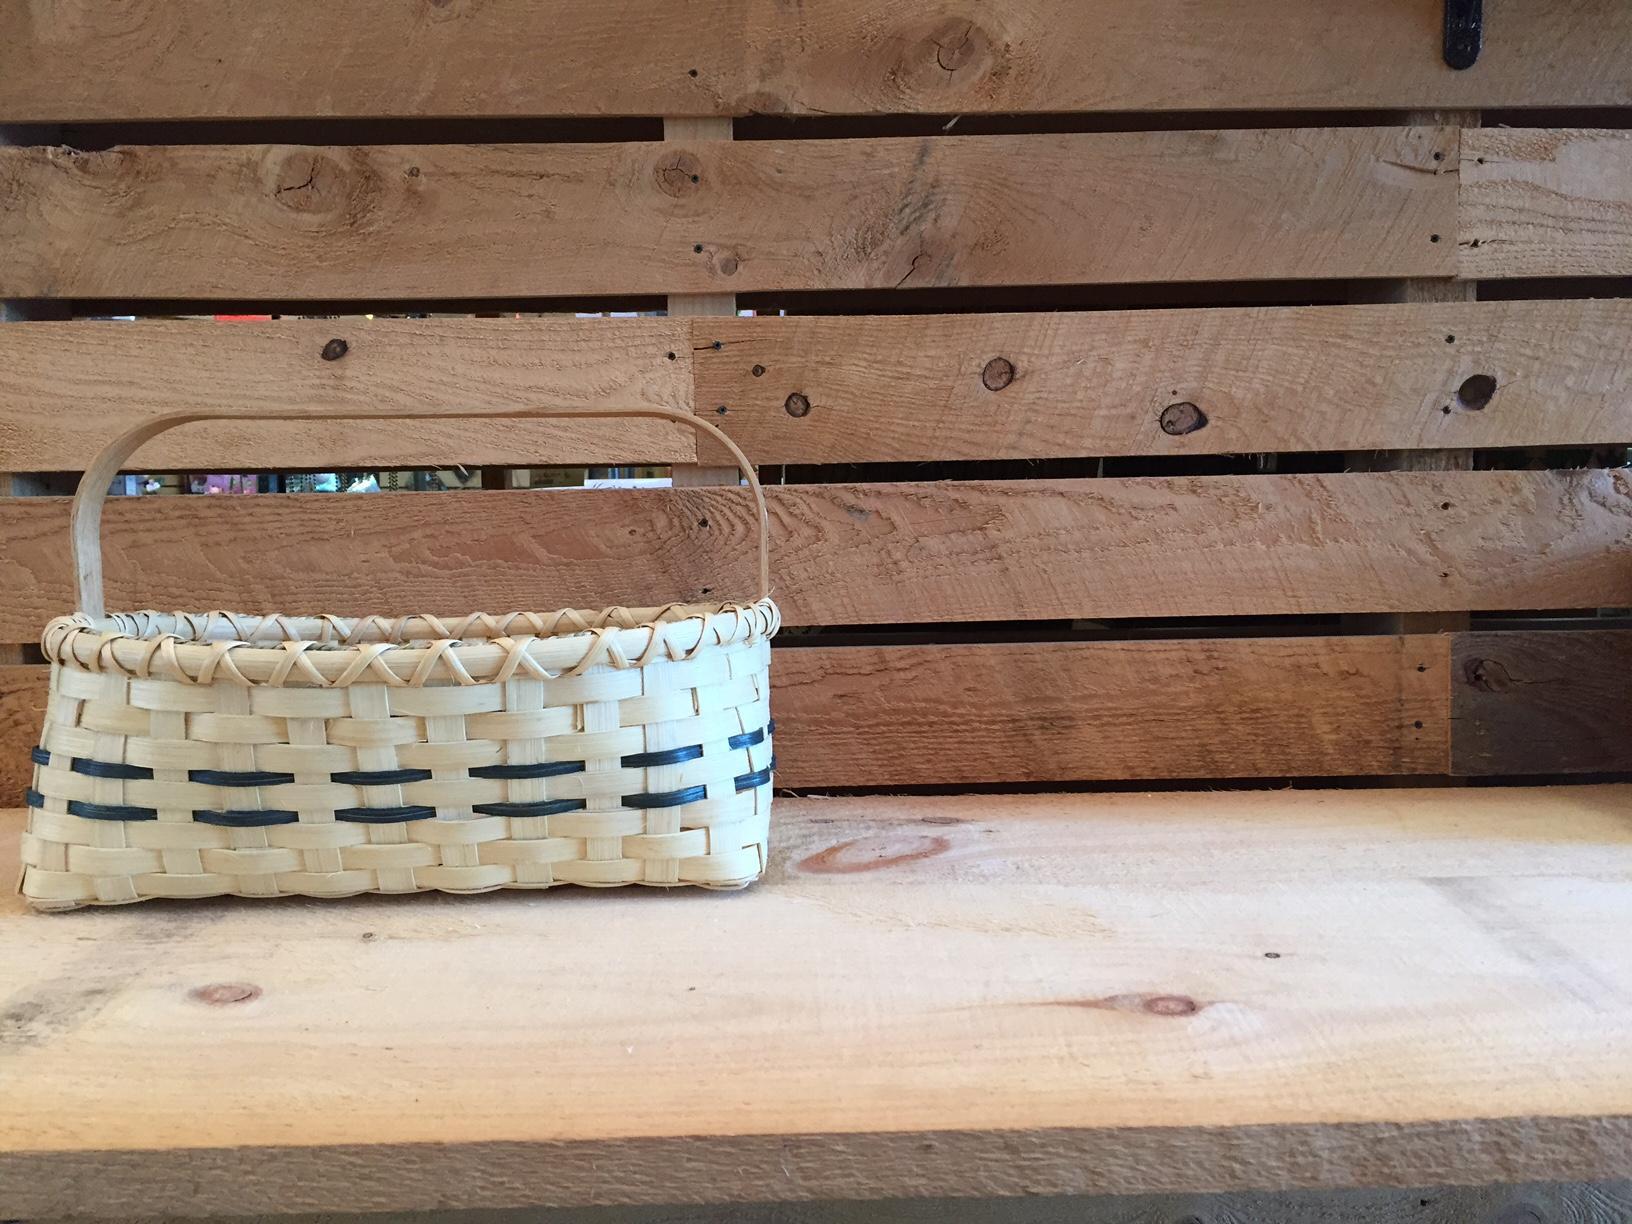 Garden basket making tickets in burlington vt united states for Gardeners supply burlington vt